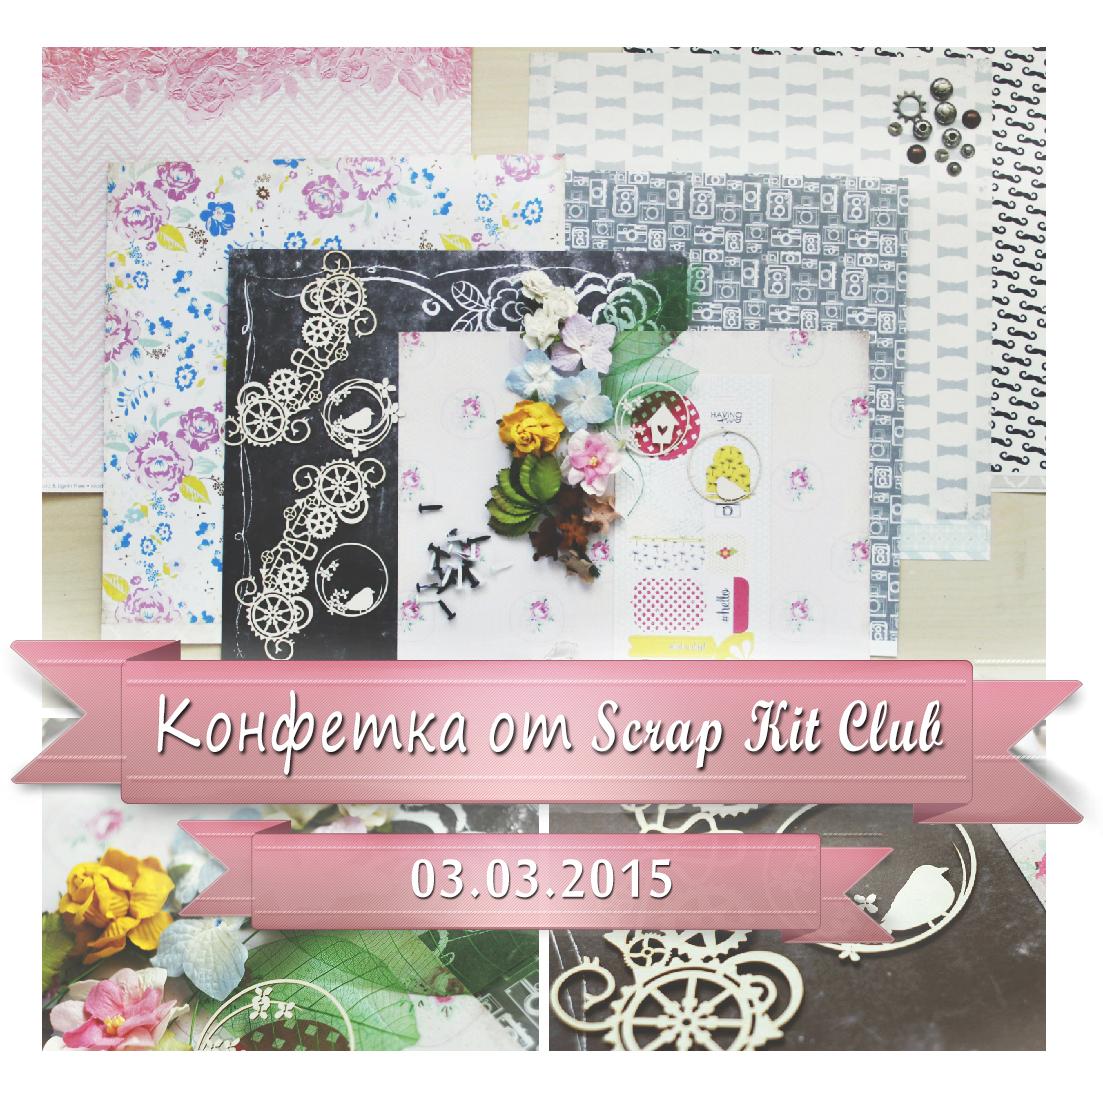 from Scrap Kit Club